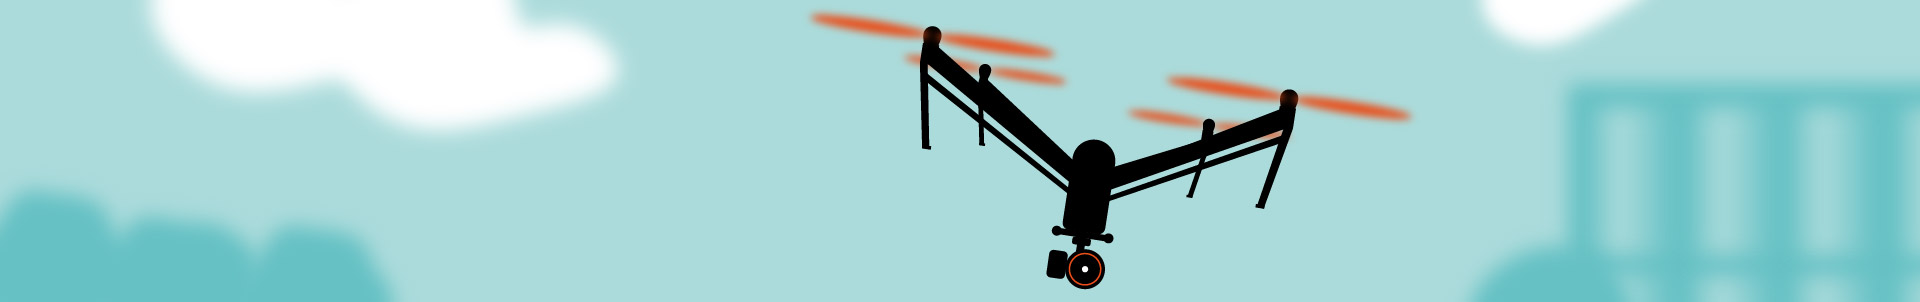 Helikopter oder Kran? Wir fliegen Kameradrohne!